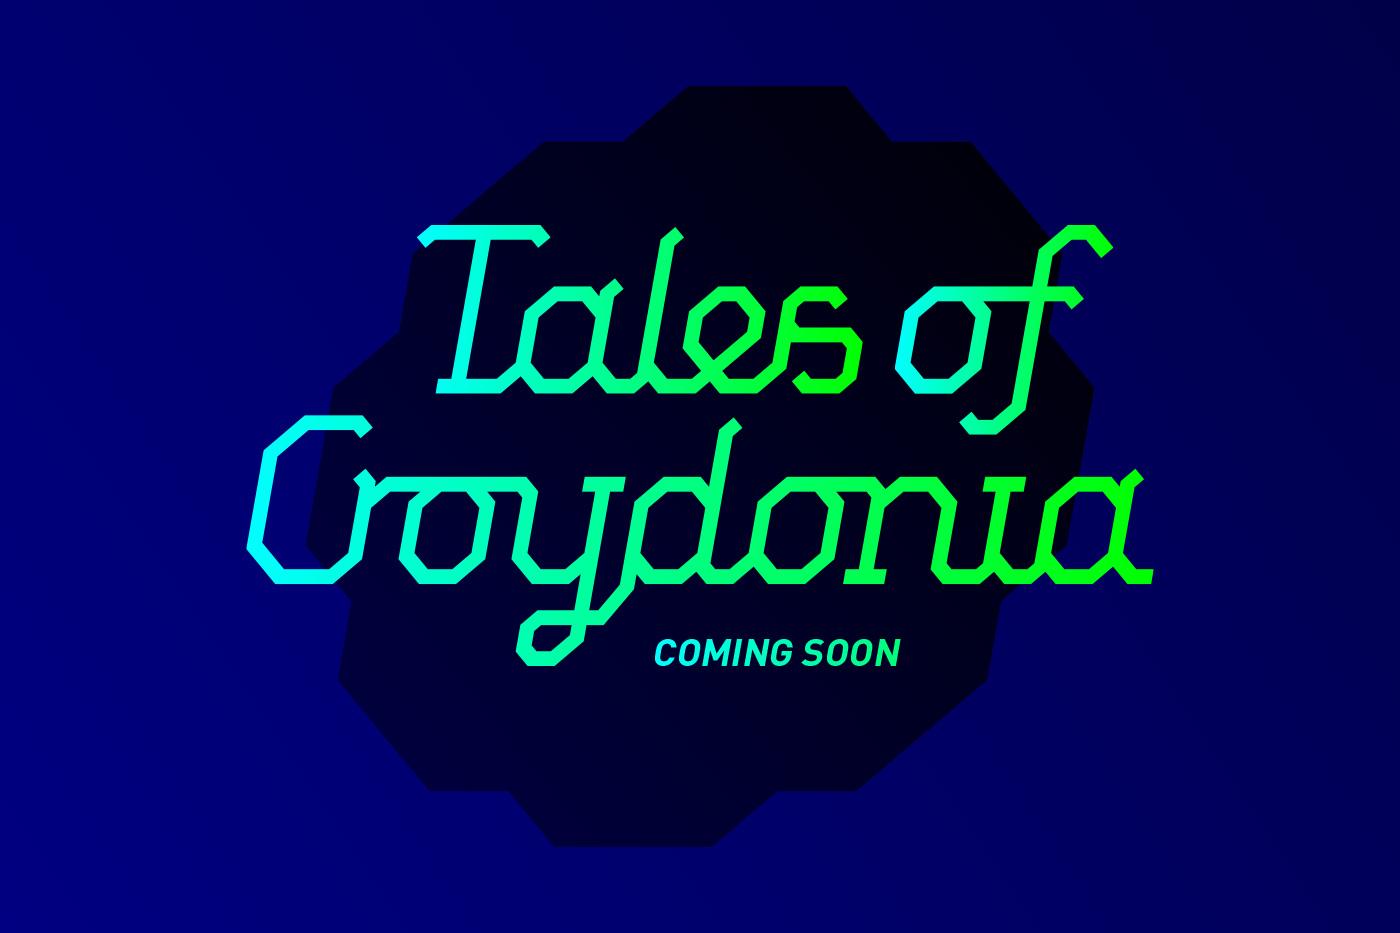 Tales of Croydon